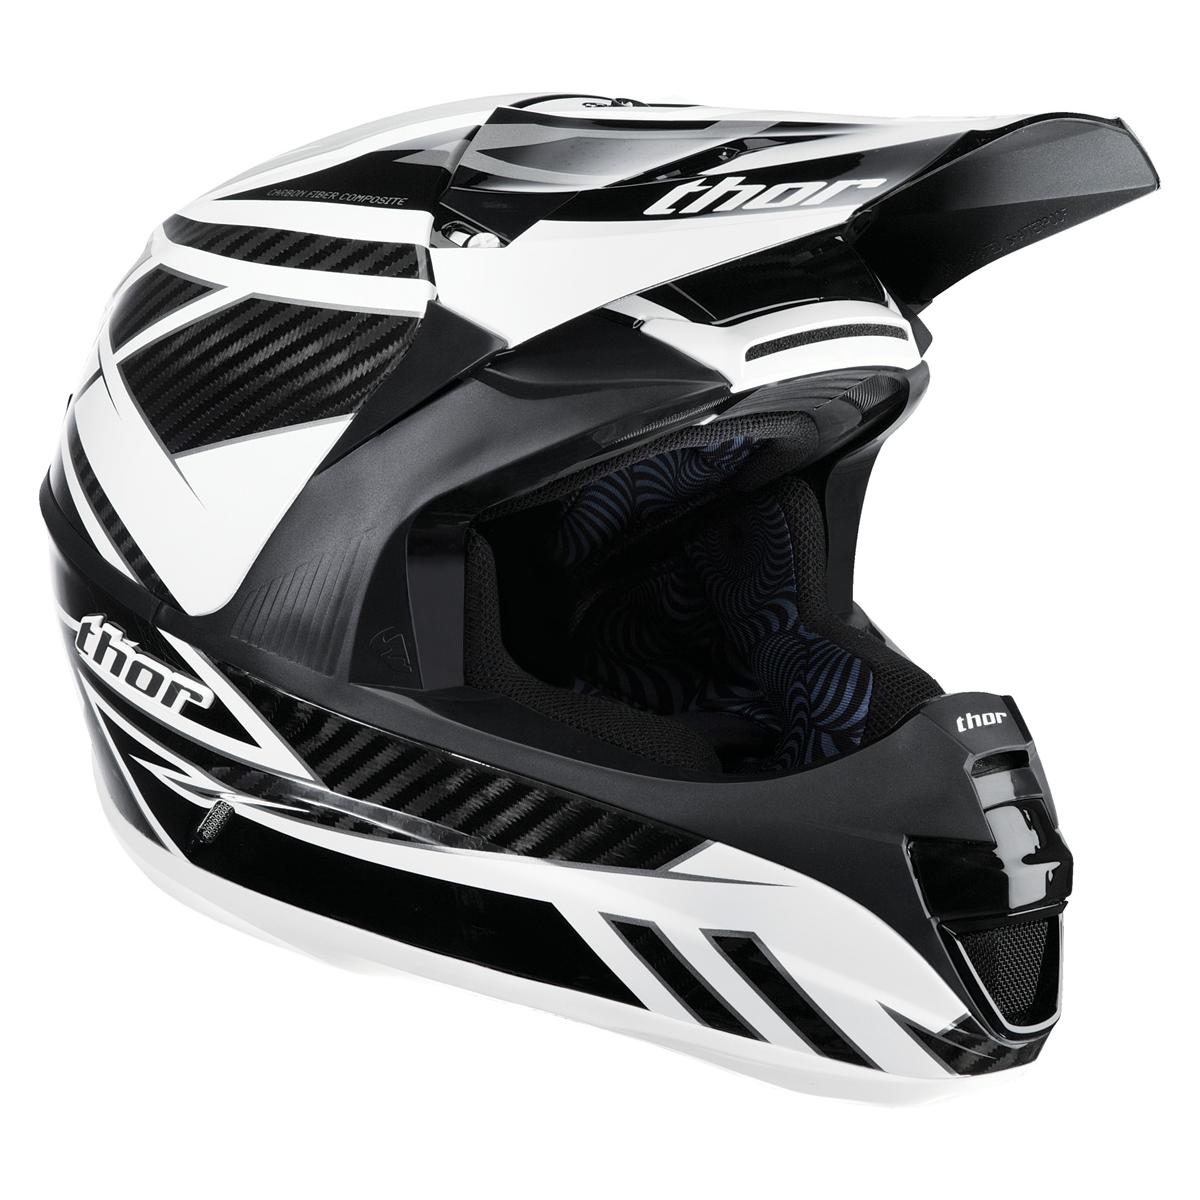 Thor helmet png. Motorcycle image purepng free